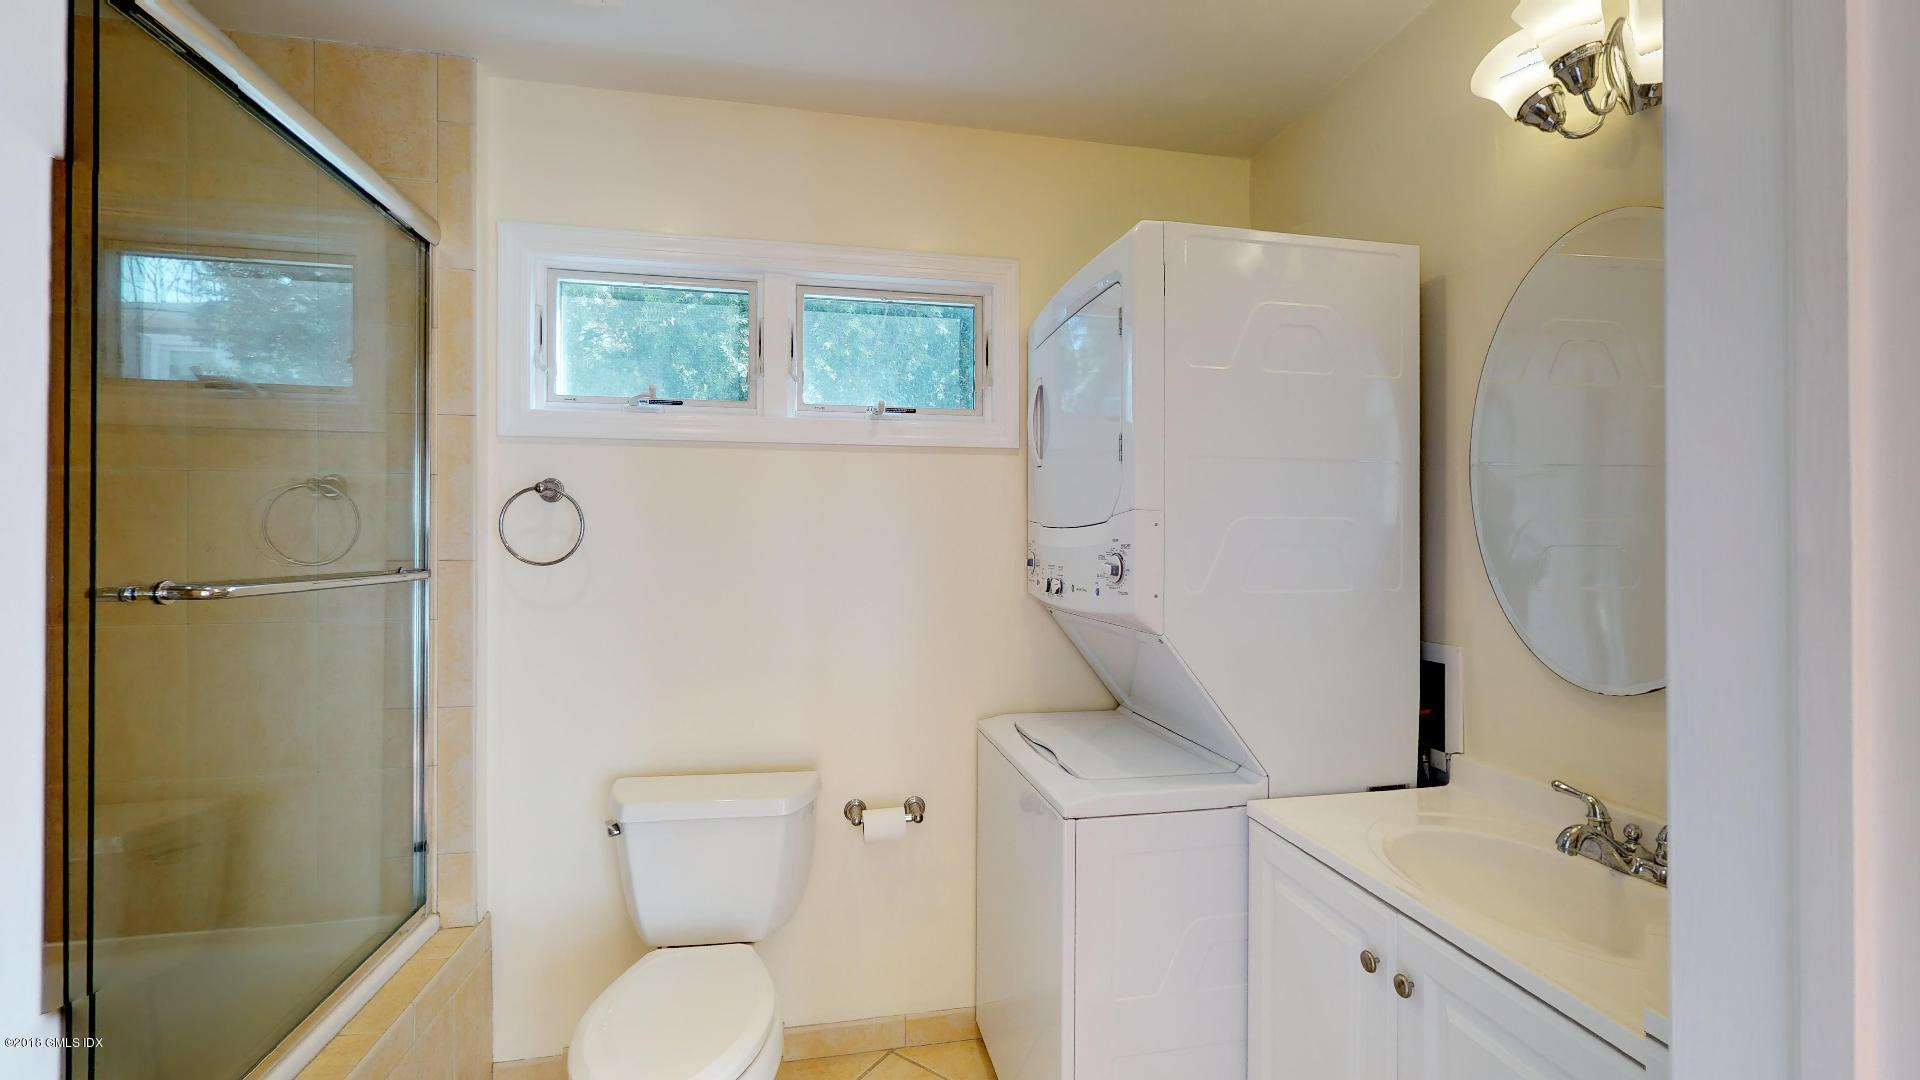 80 Sound Beach Avenue,Riverside,Connecticut 06878,4 Bedrooms Bedrooms,2 BathroomsBathrooms,Single family,Sound Beach,104869